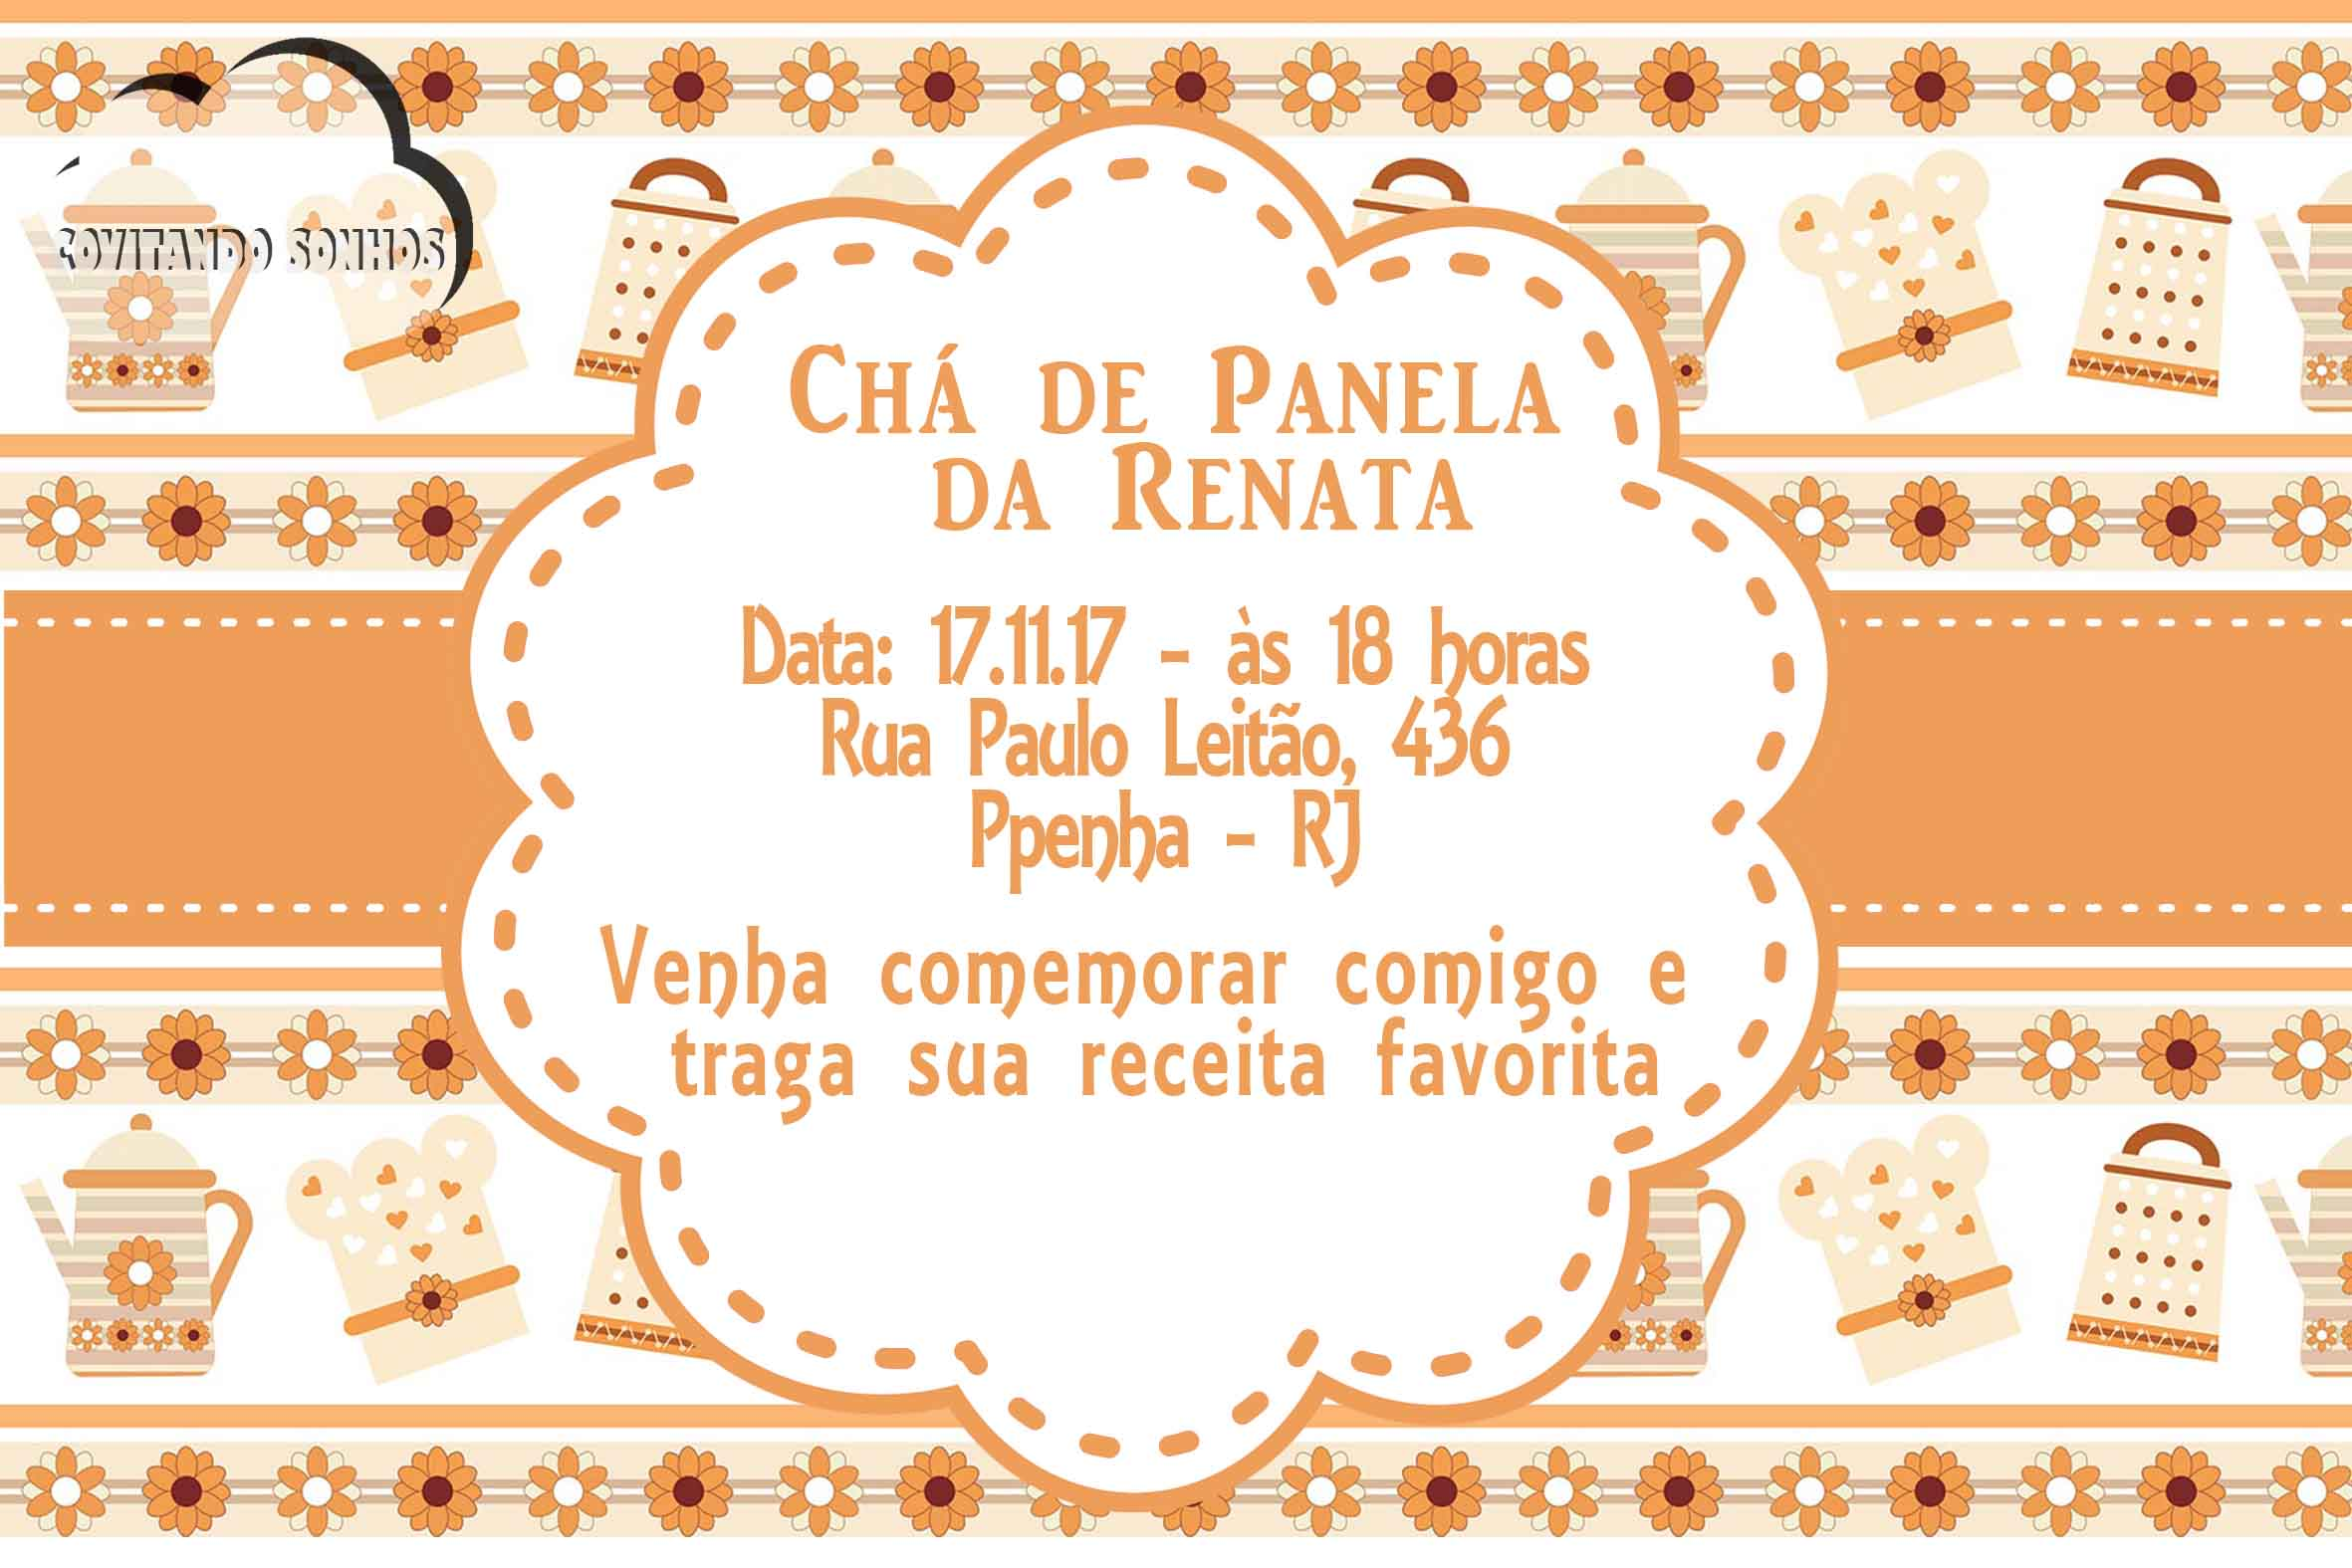 Convite Digital Chá De Panela No Elo7 Convitando Sonhos C5e60c